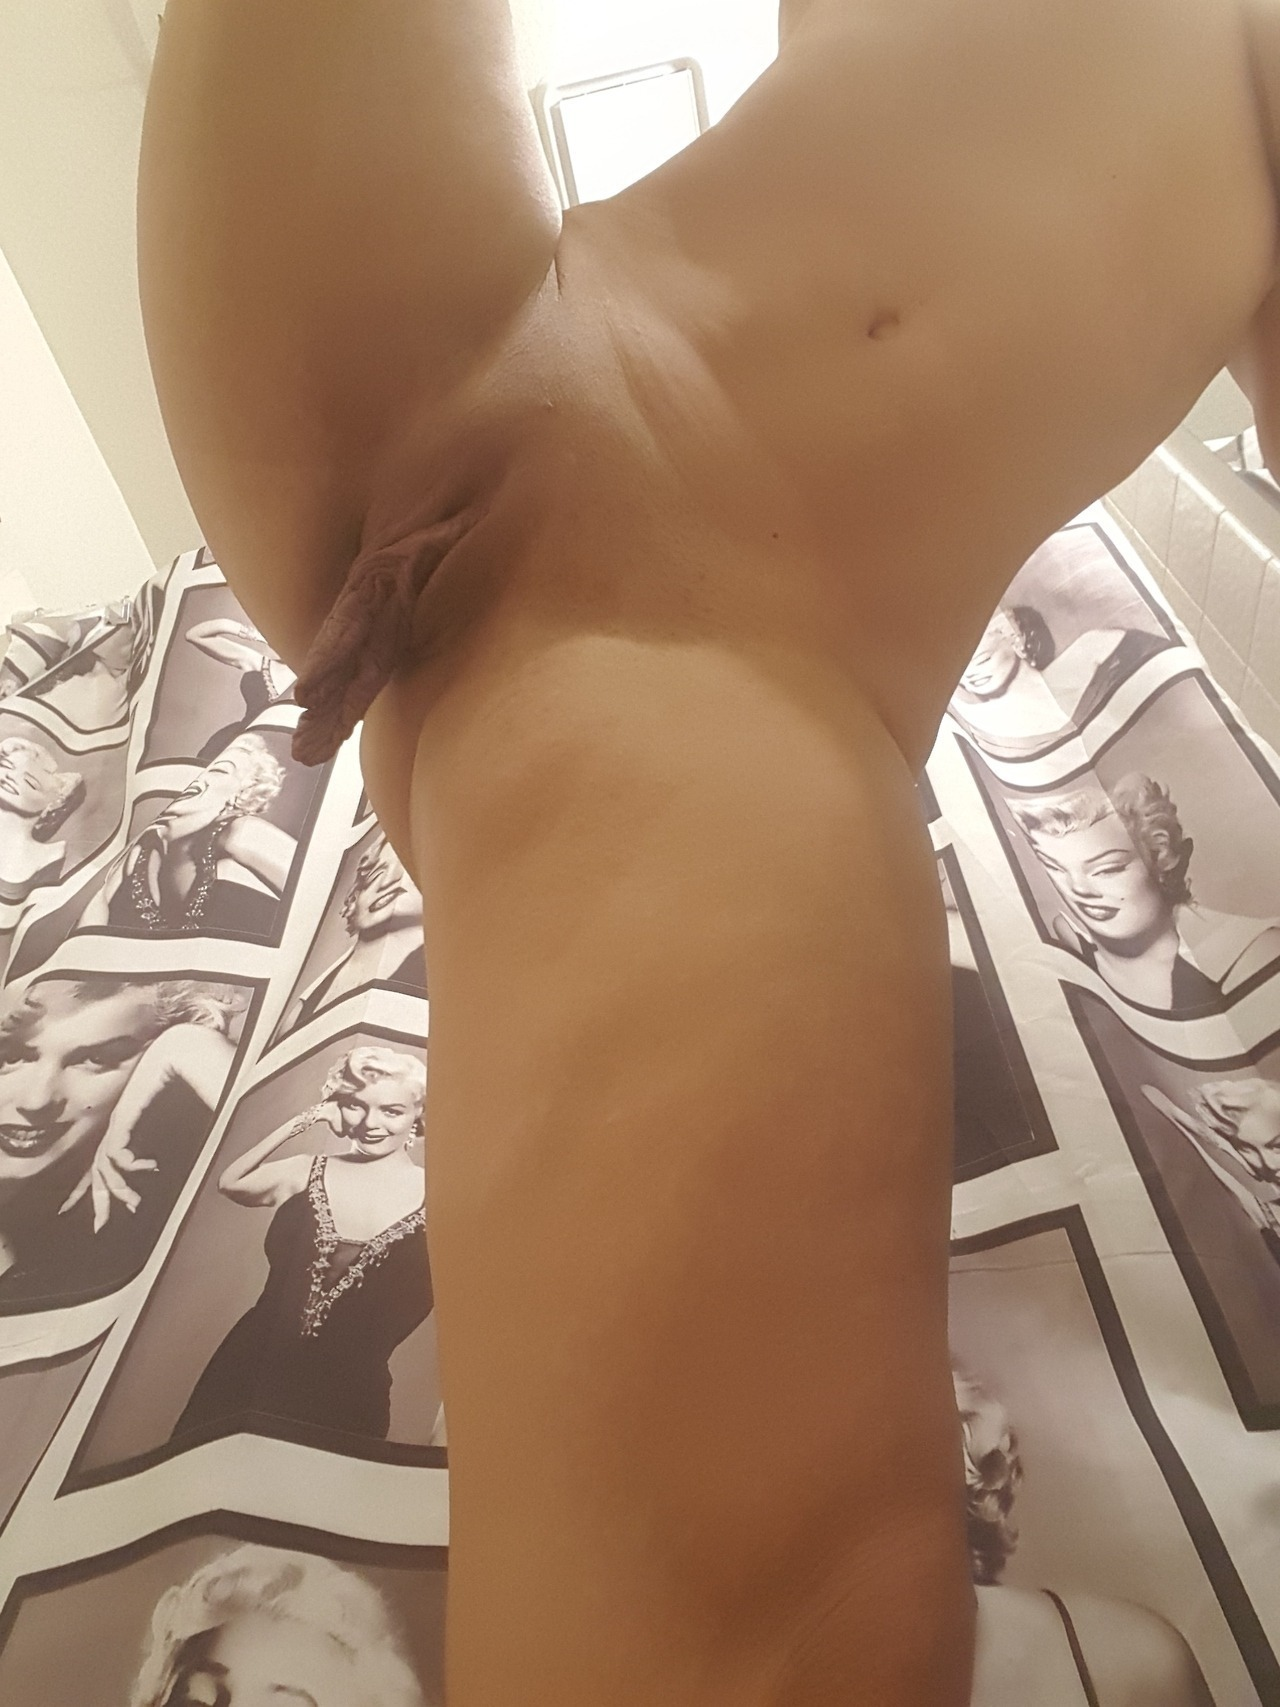 large pussy tumblr